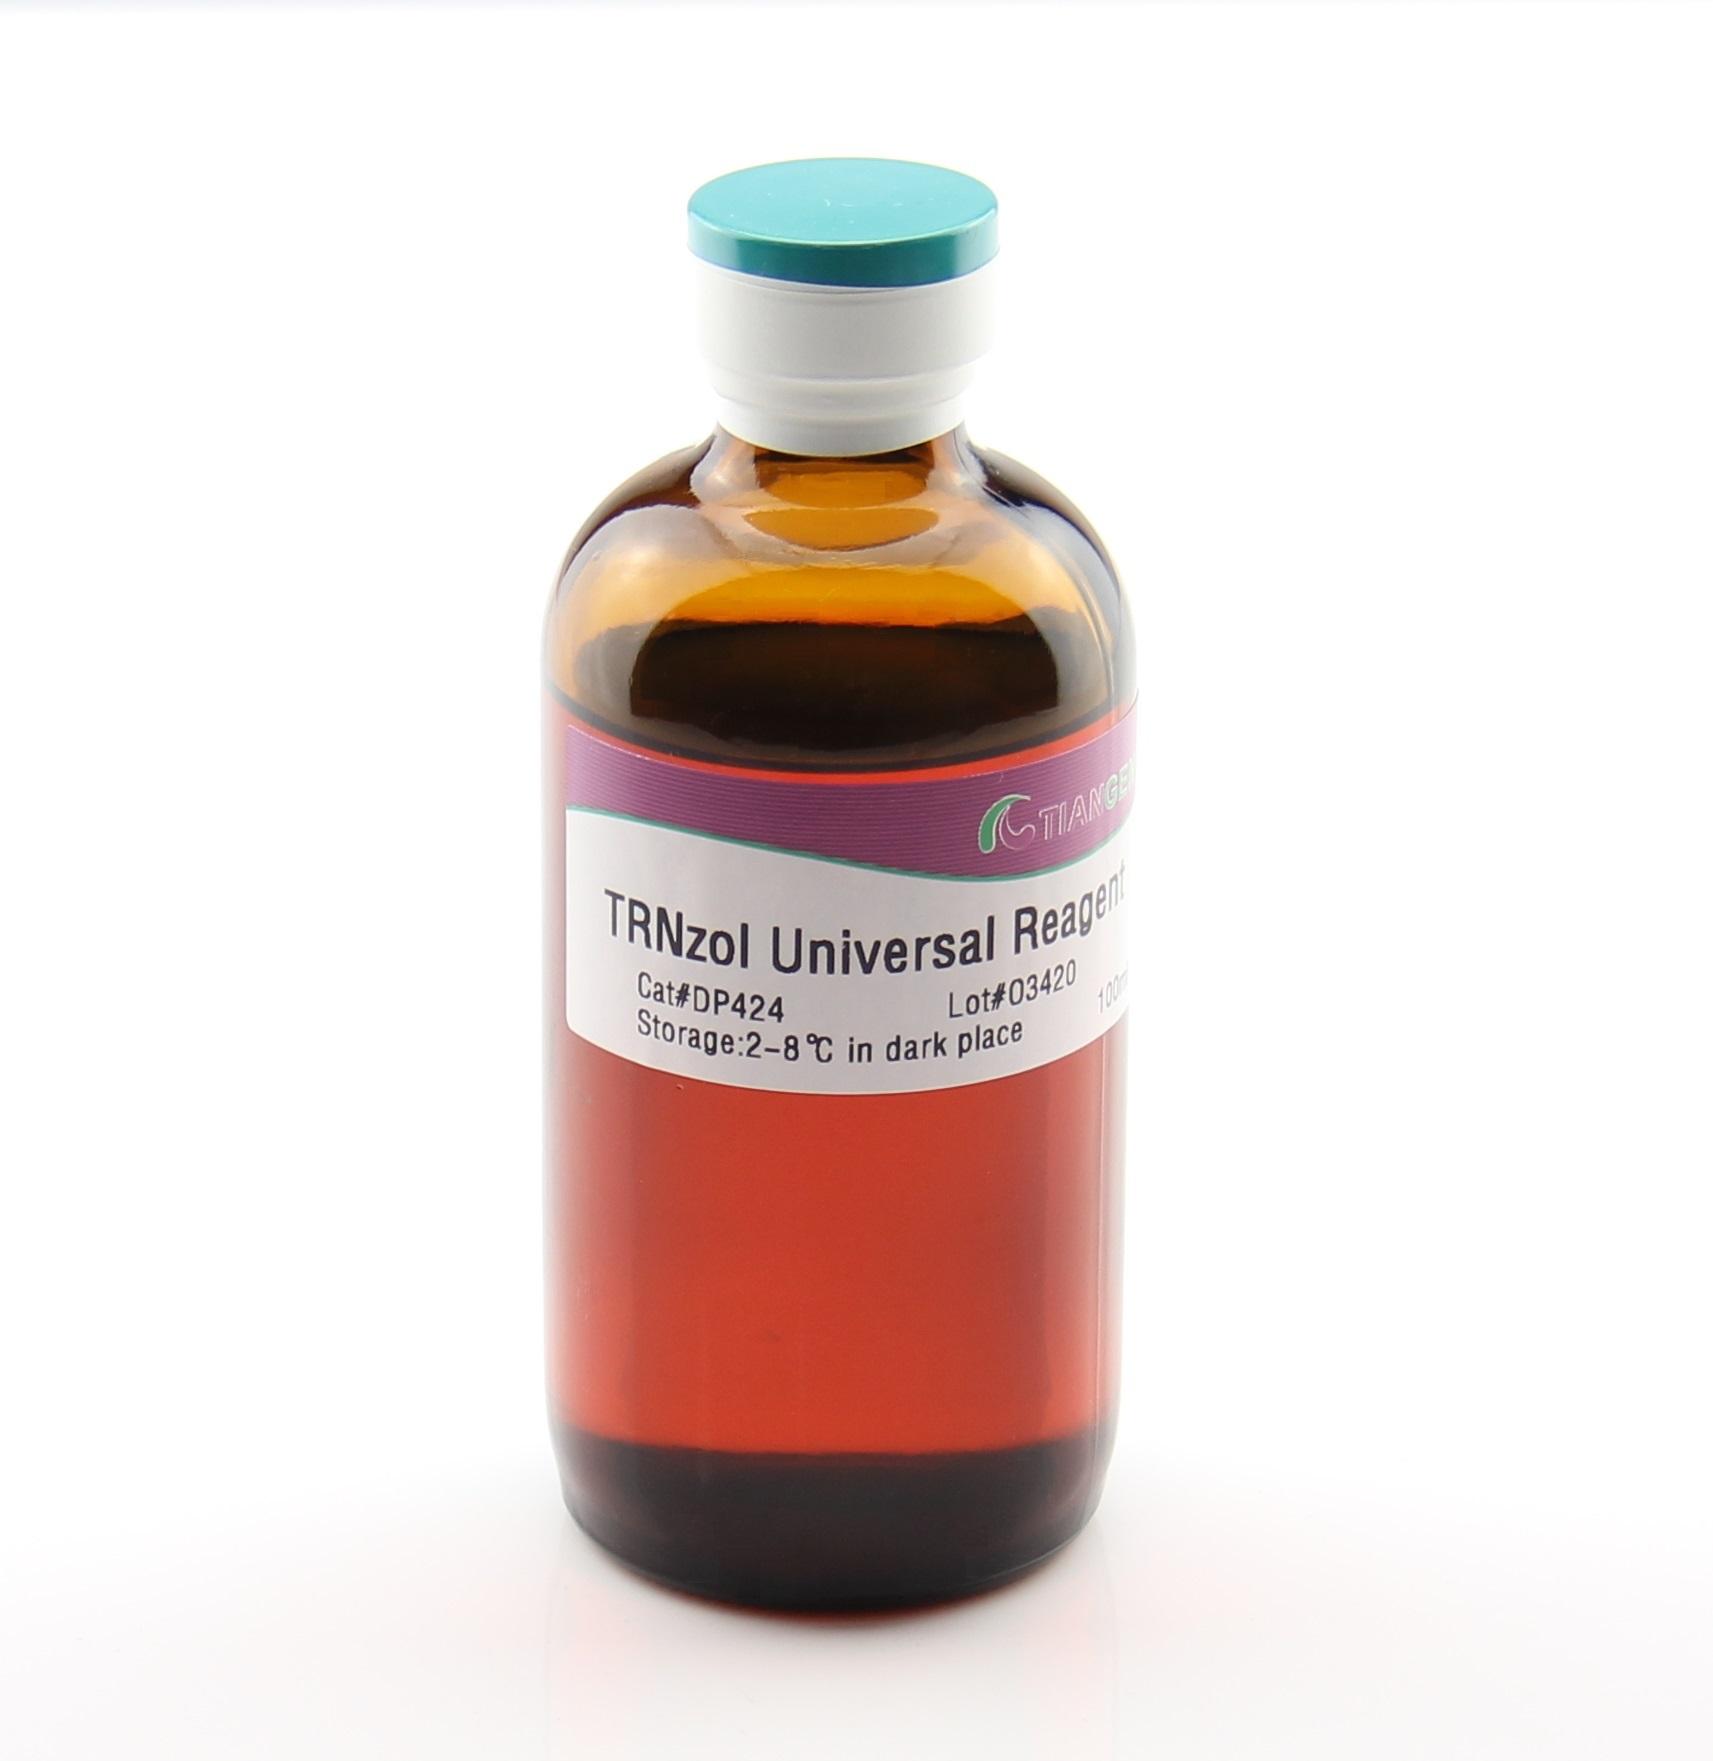 TRNzol Universal 總 RNA 提取試劑(DP424)